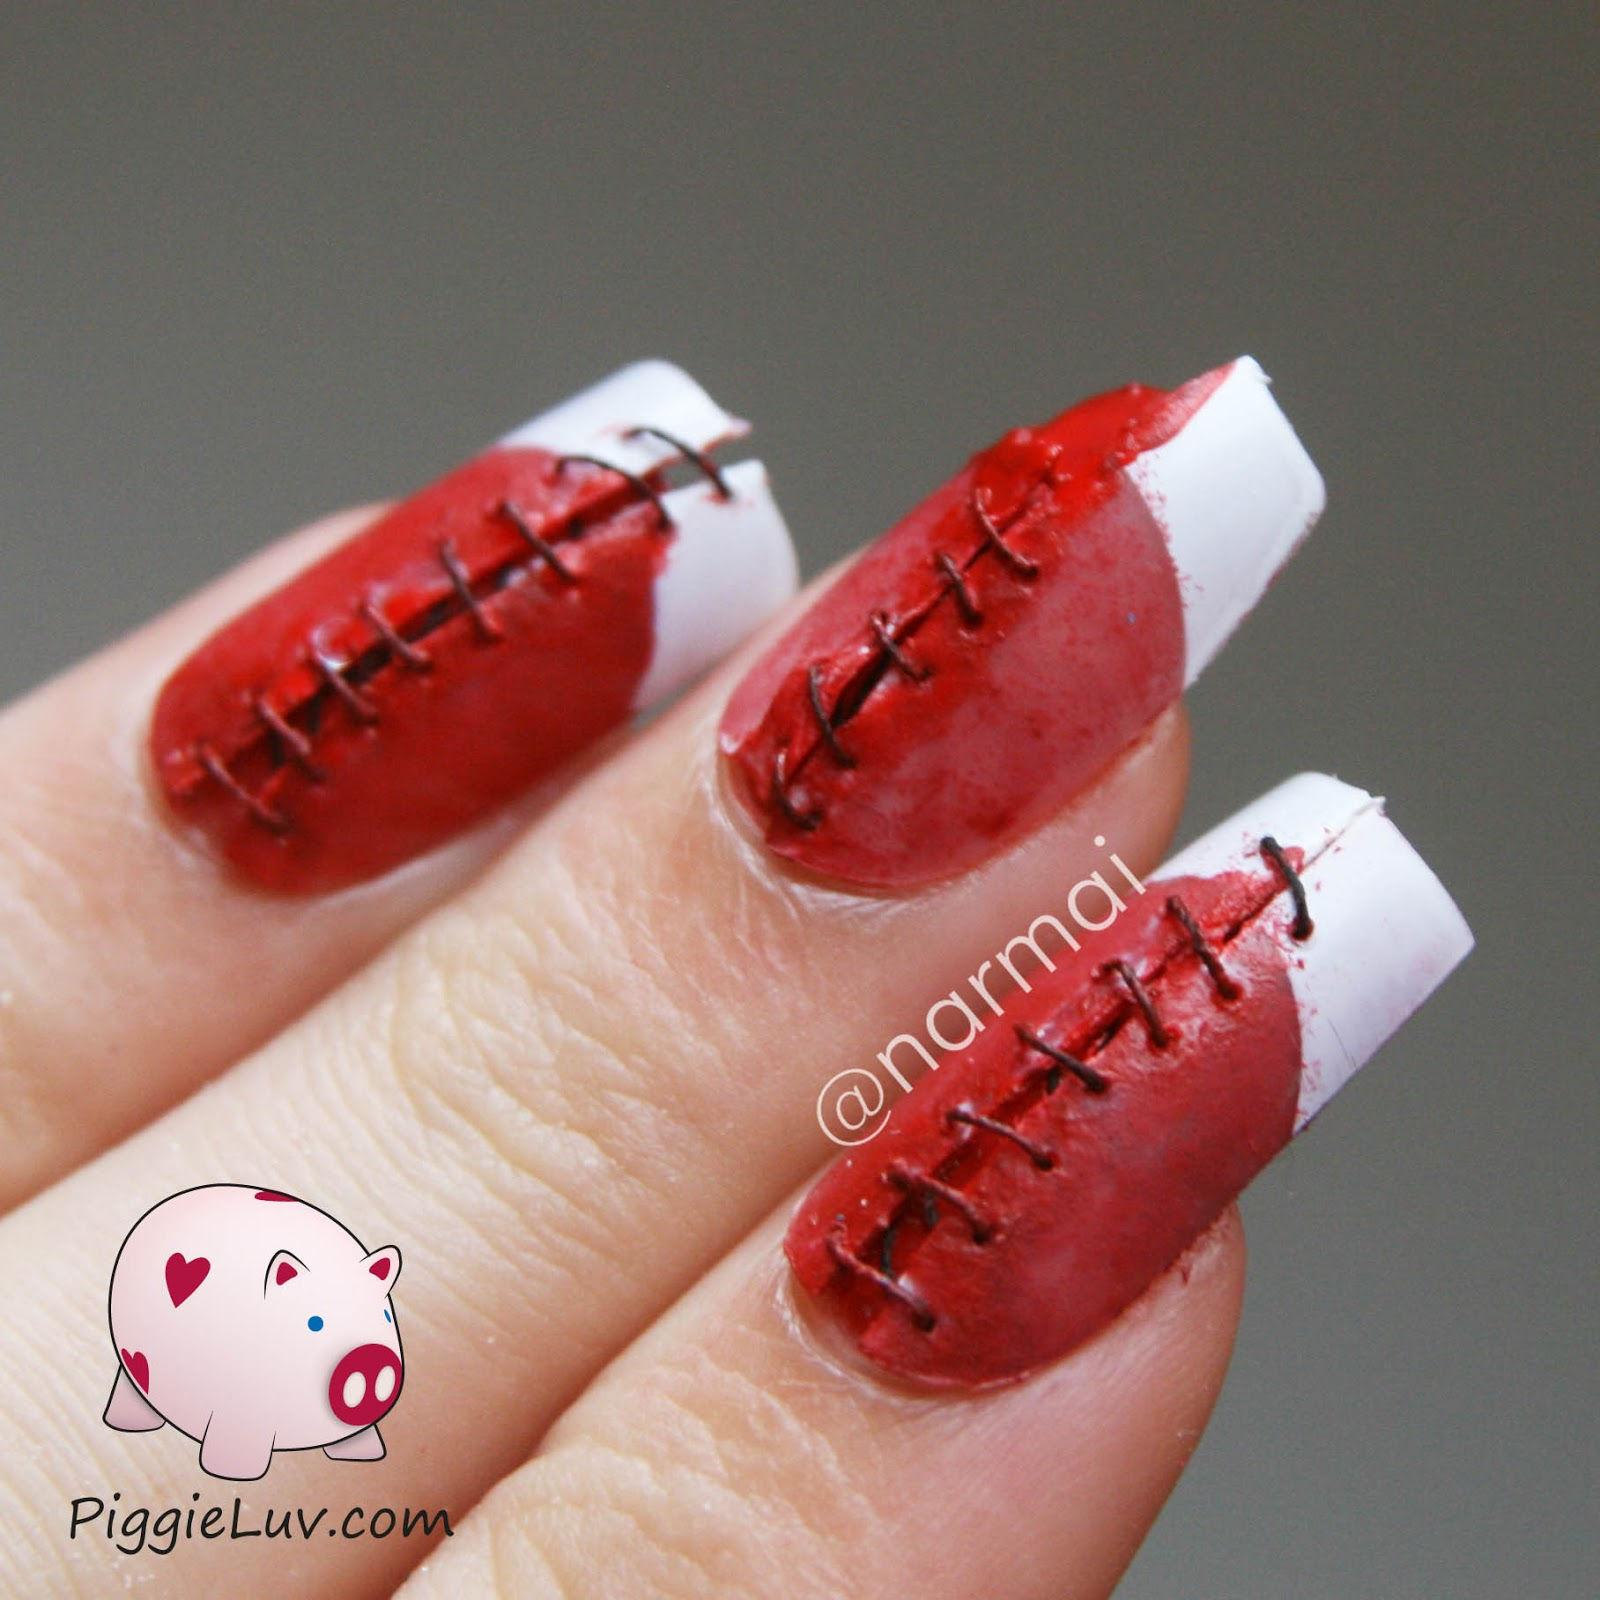 PiggieLuv: Bloody stitches nail art for Halloween